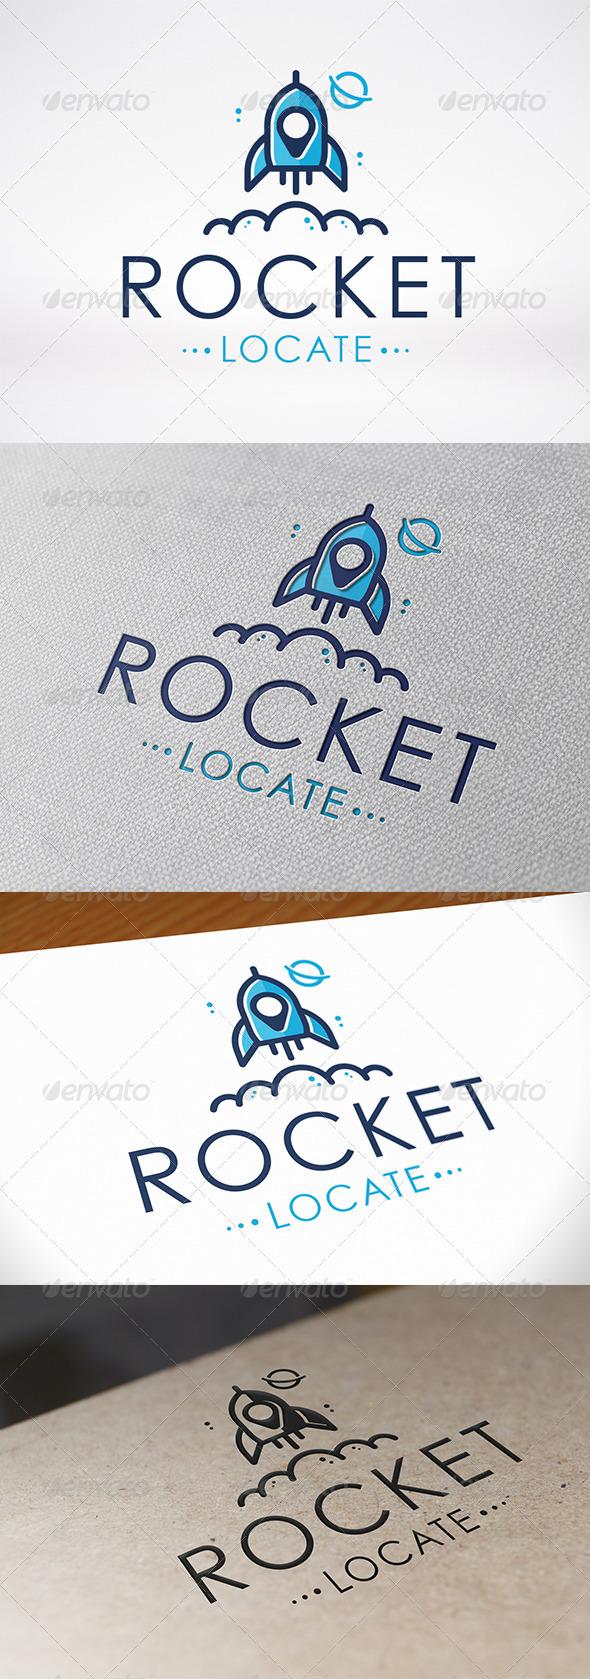 Rocket Locator Logo Template